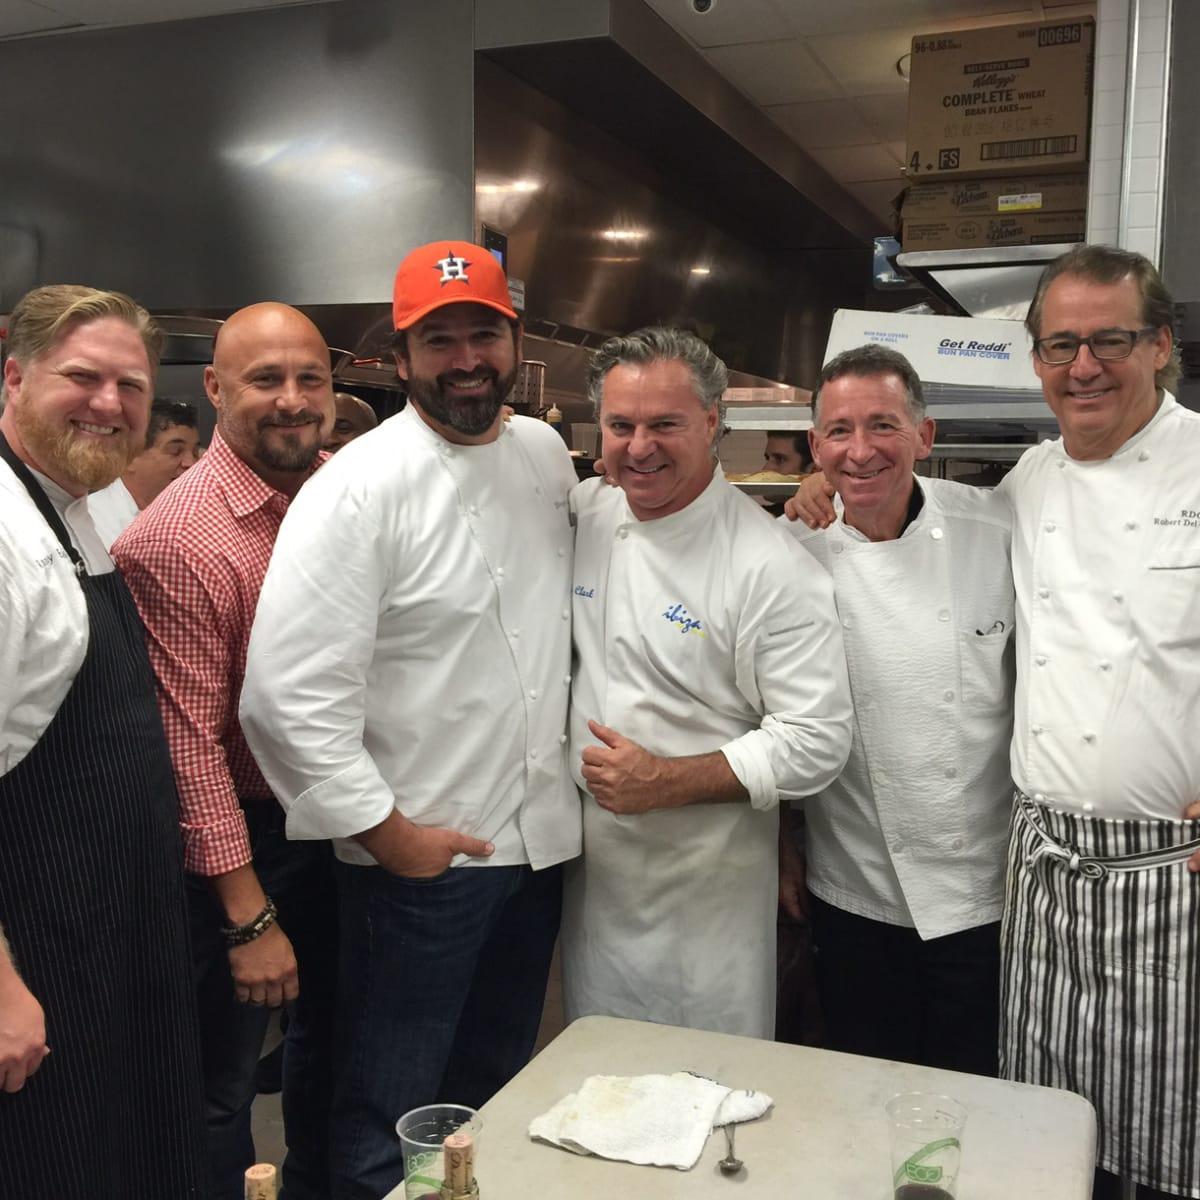 Recipe For Success 10th anny dinner, 5/16  Randy Evans, Randy Rucker, Bryan Caswell, Charles Clark, John Sheely, Robert Del Grande